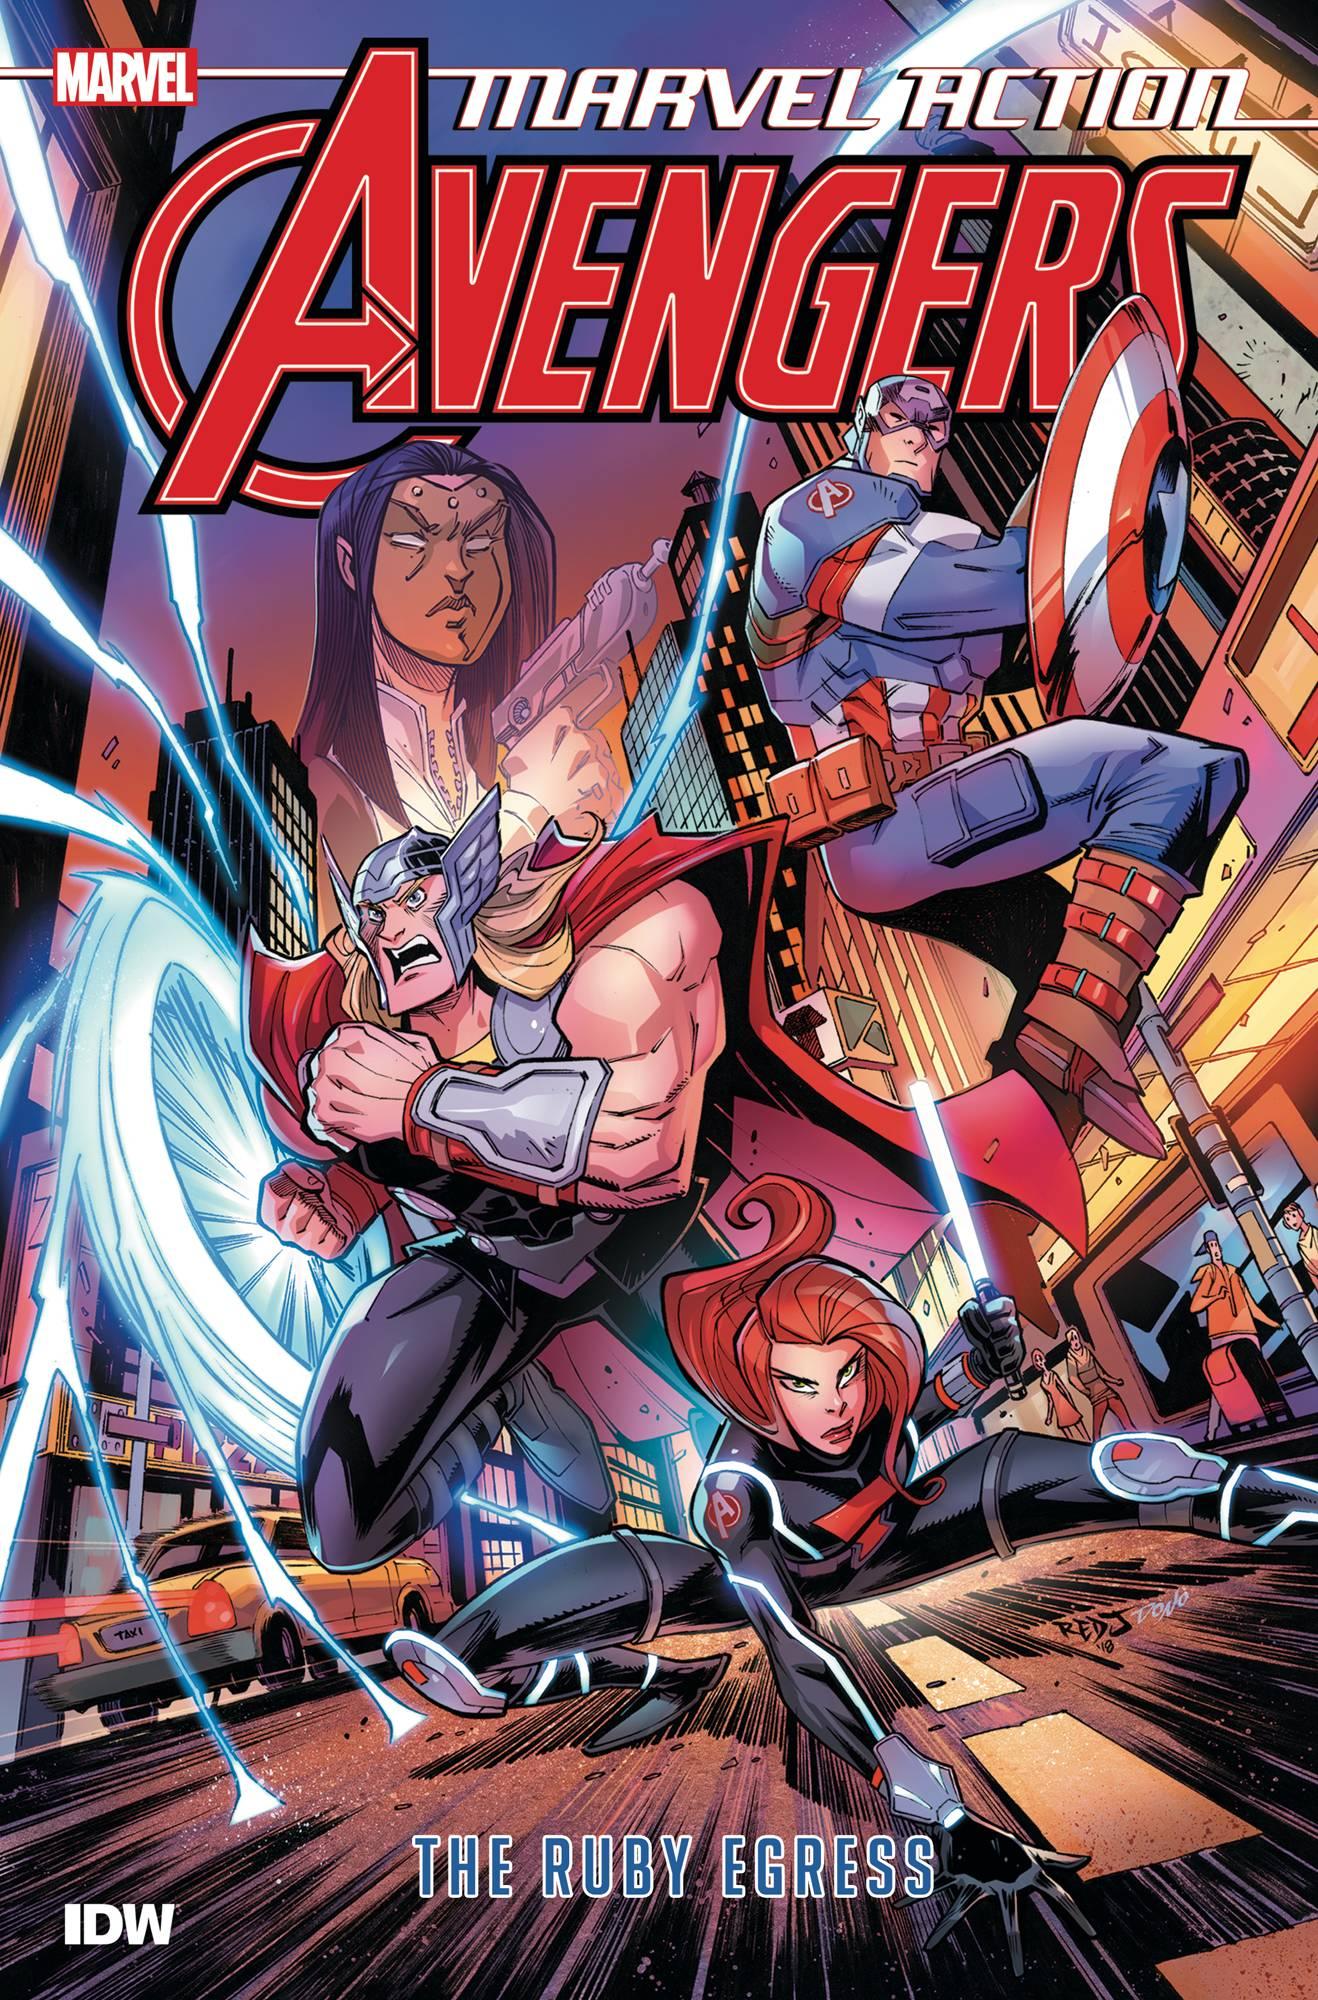 Marvel Action Avengers TP Vol. 2 Ruby Egress